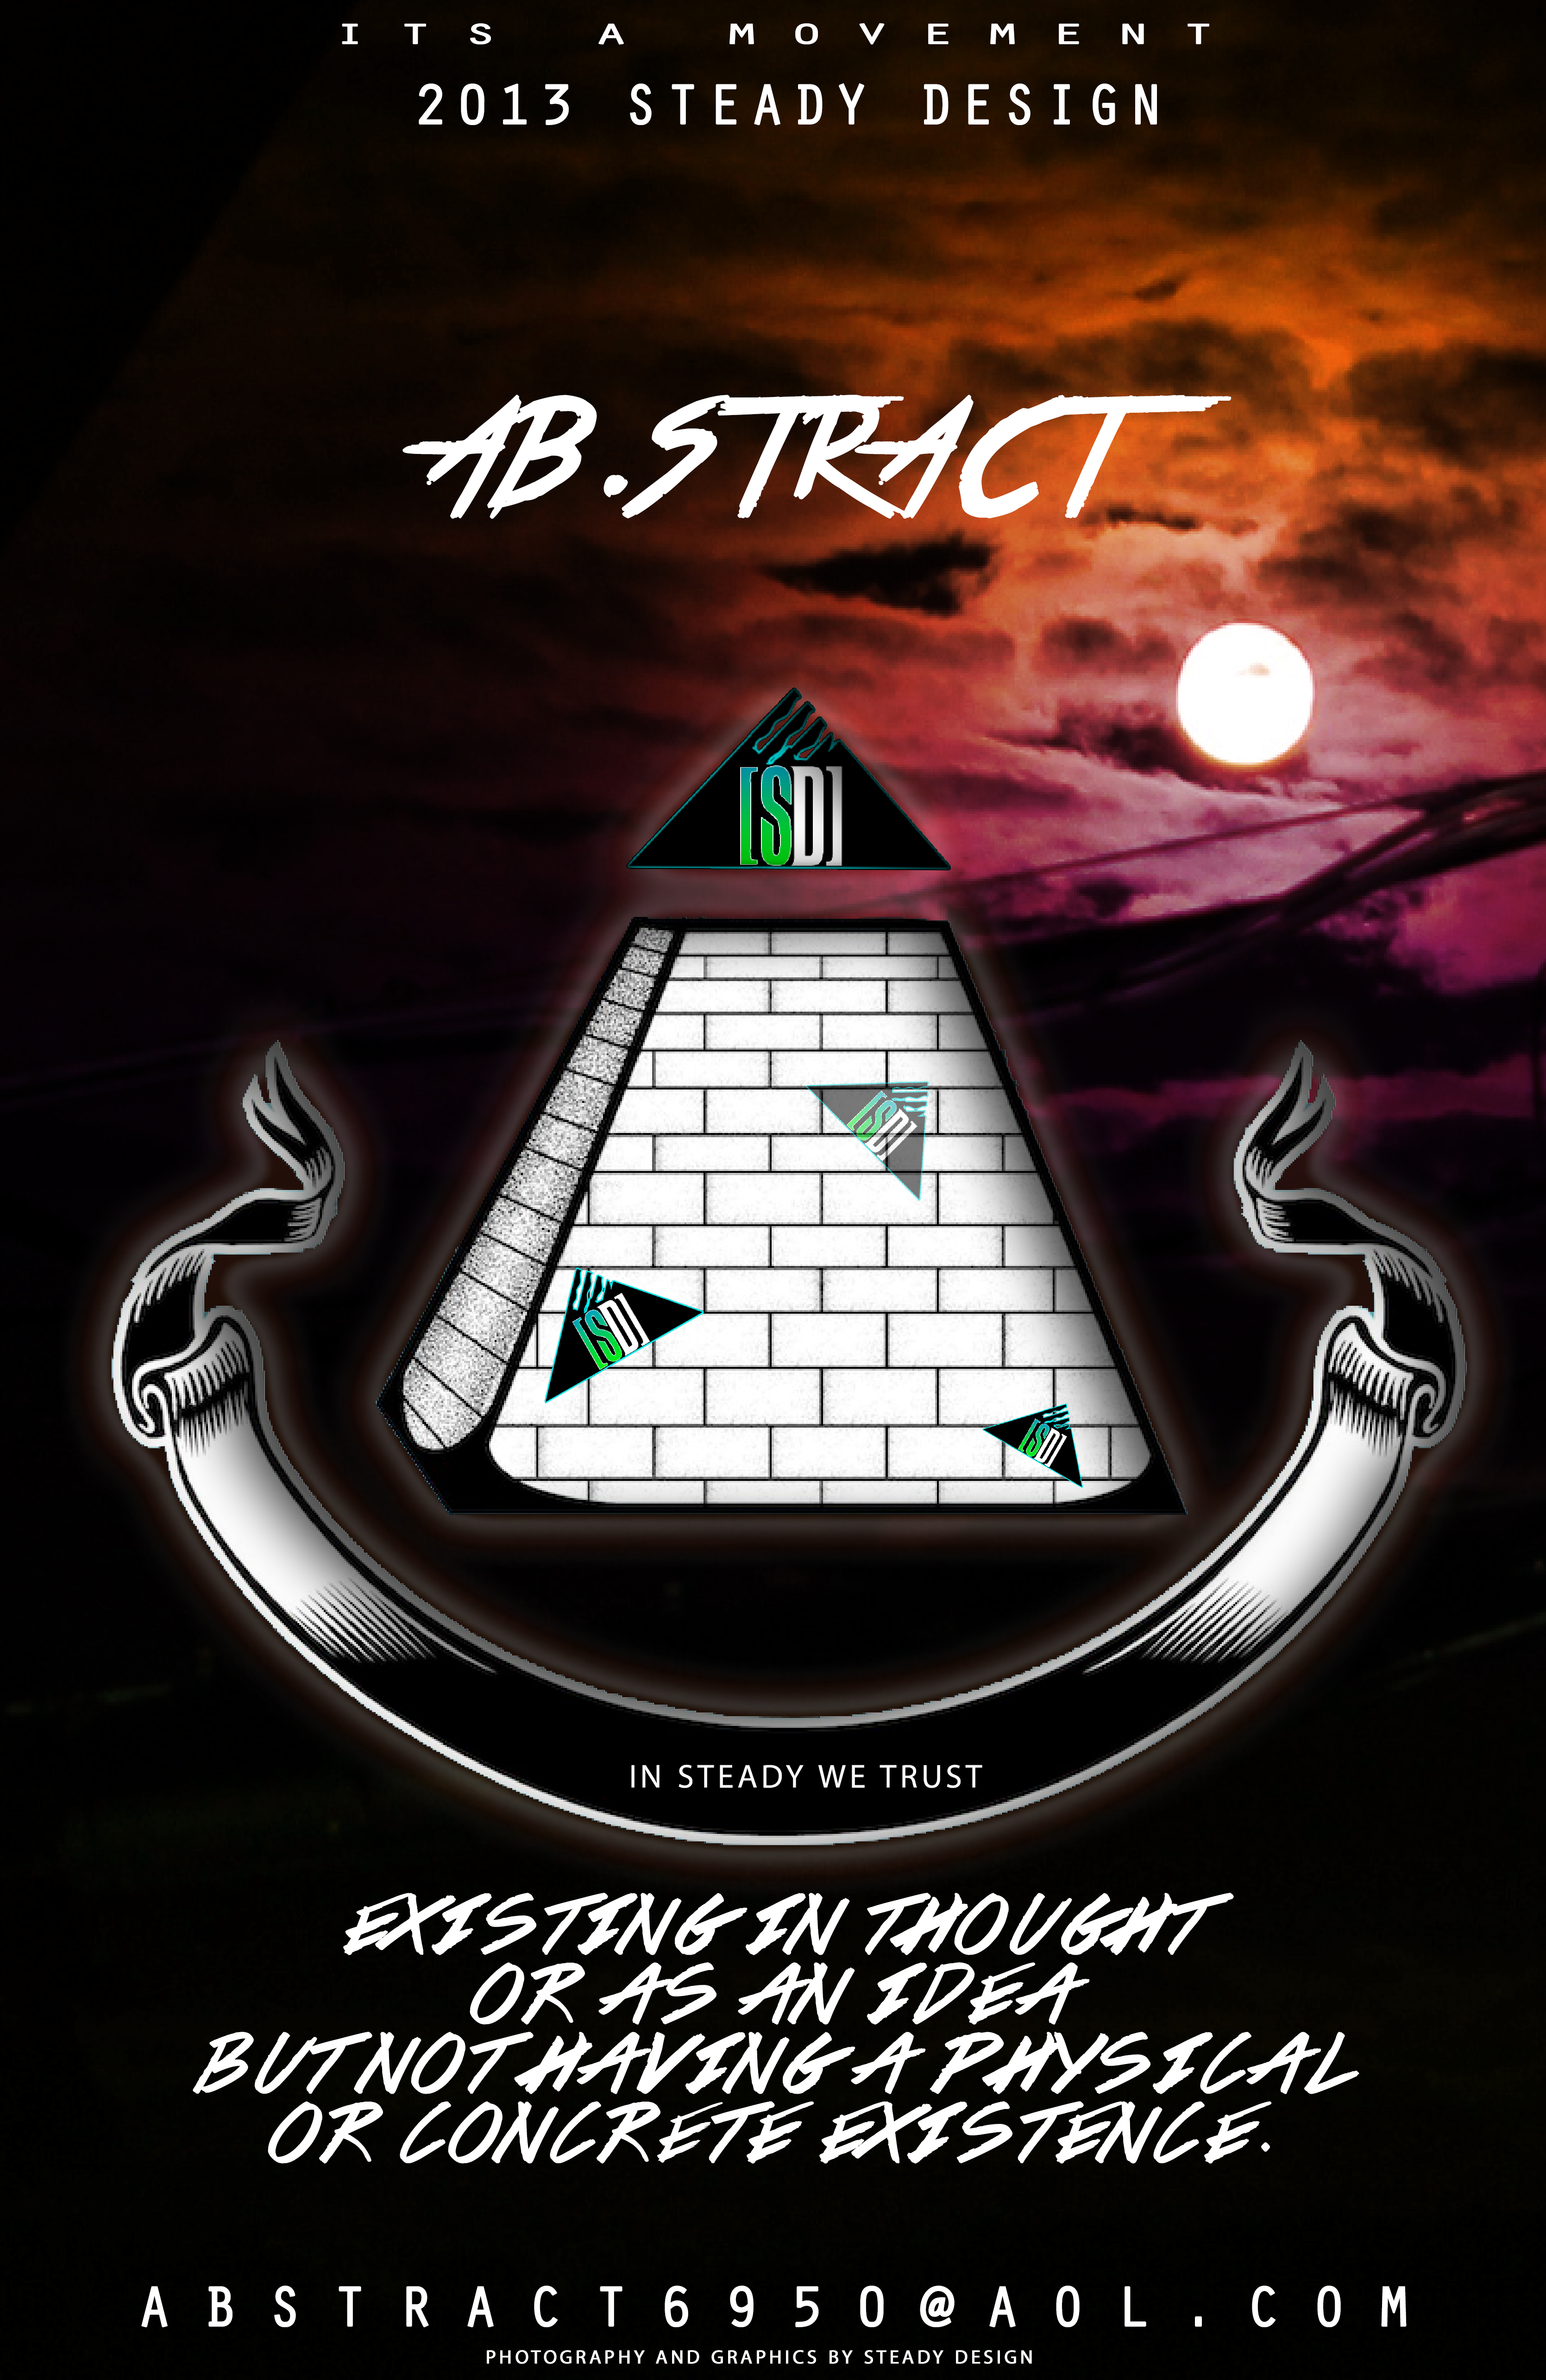 ab.stract